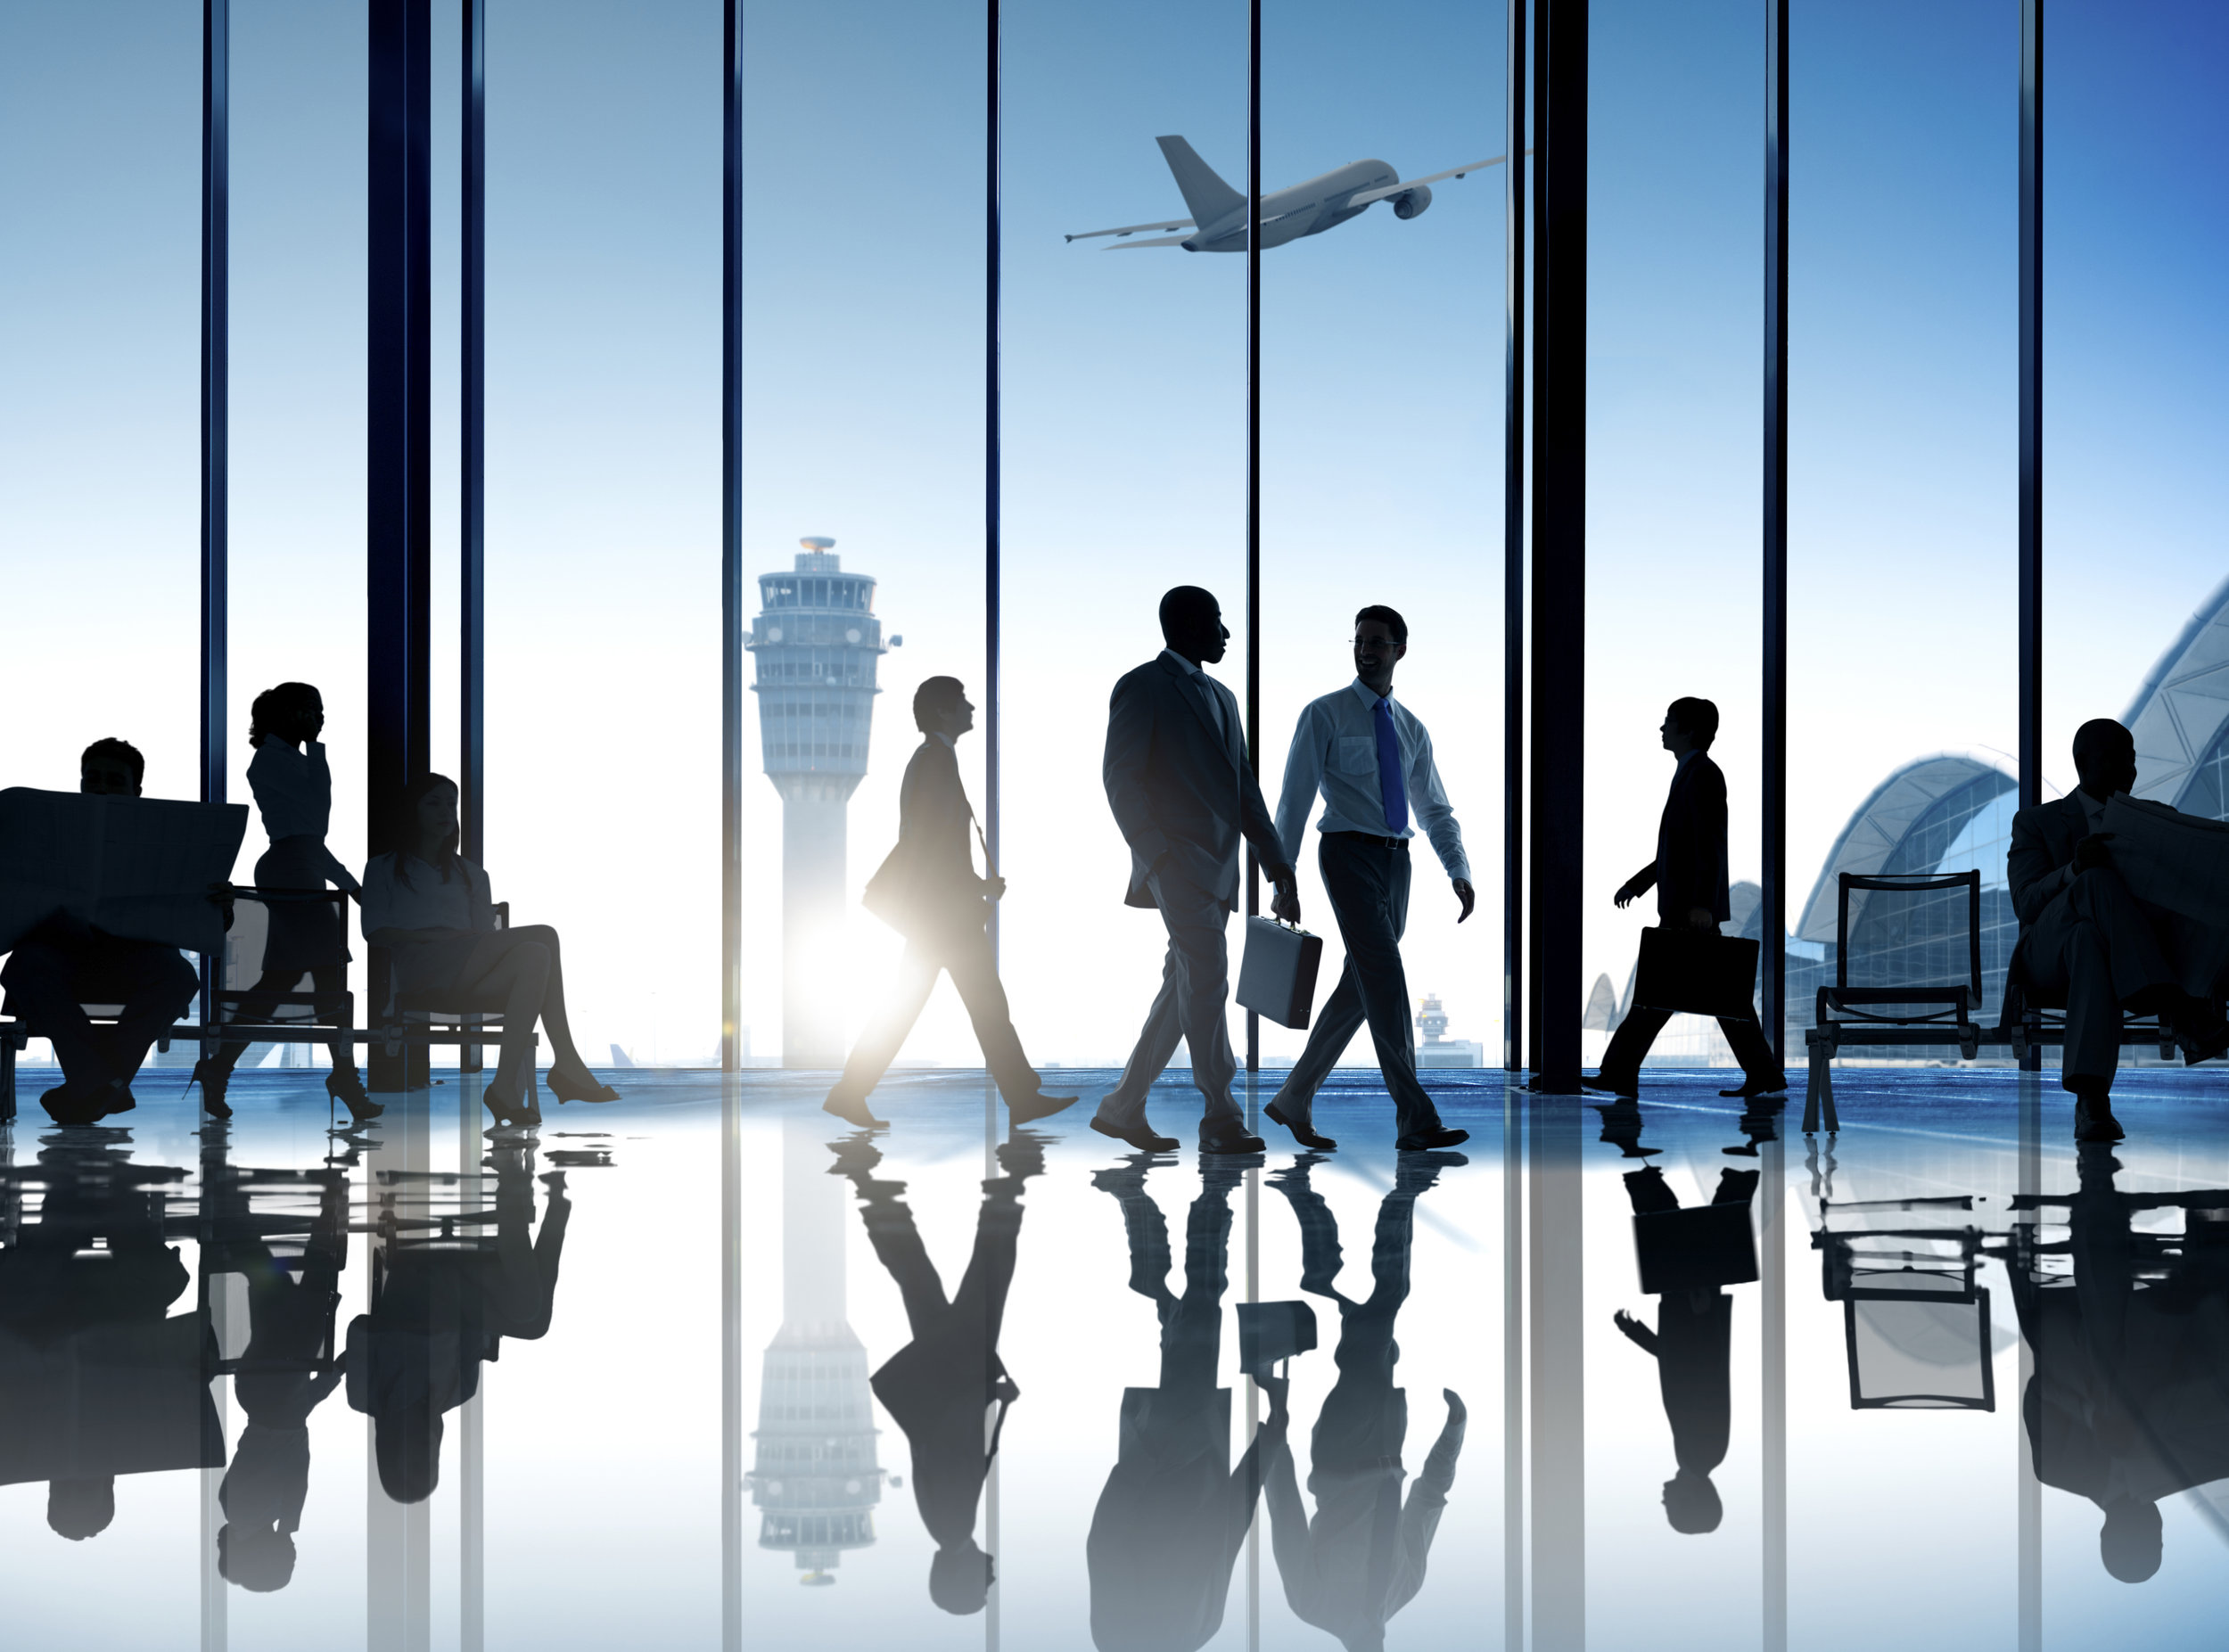 bigstock-Corporate-business-travel-211383160.jpg